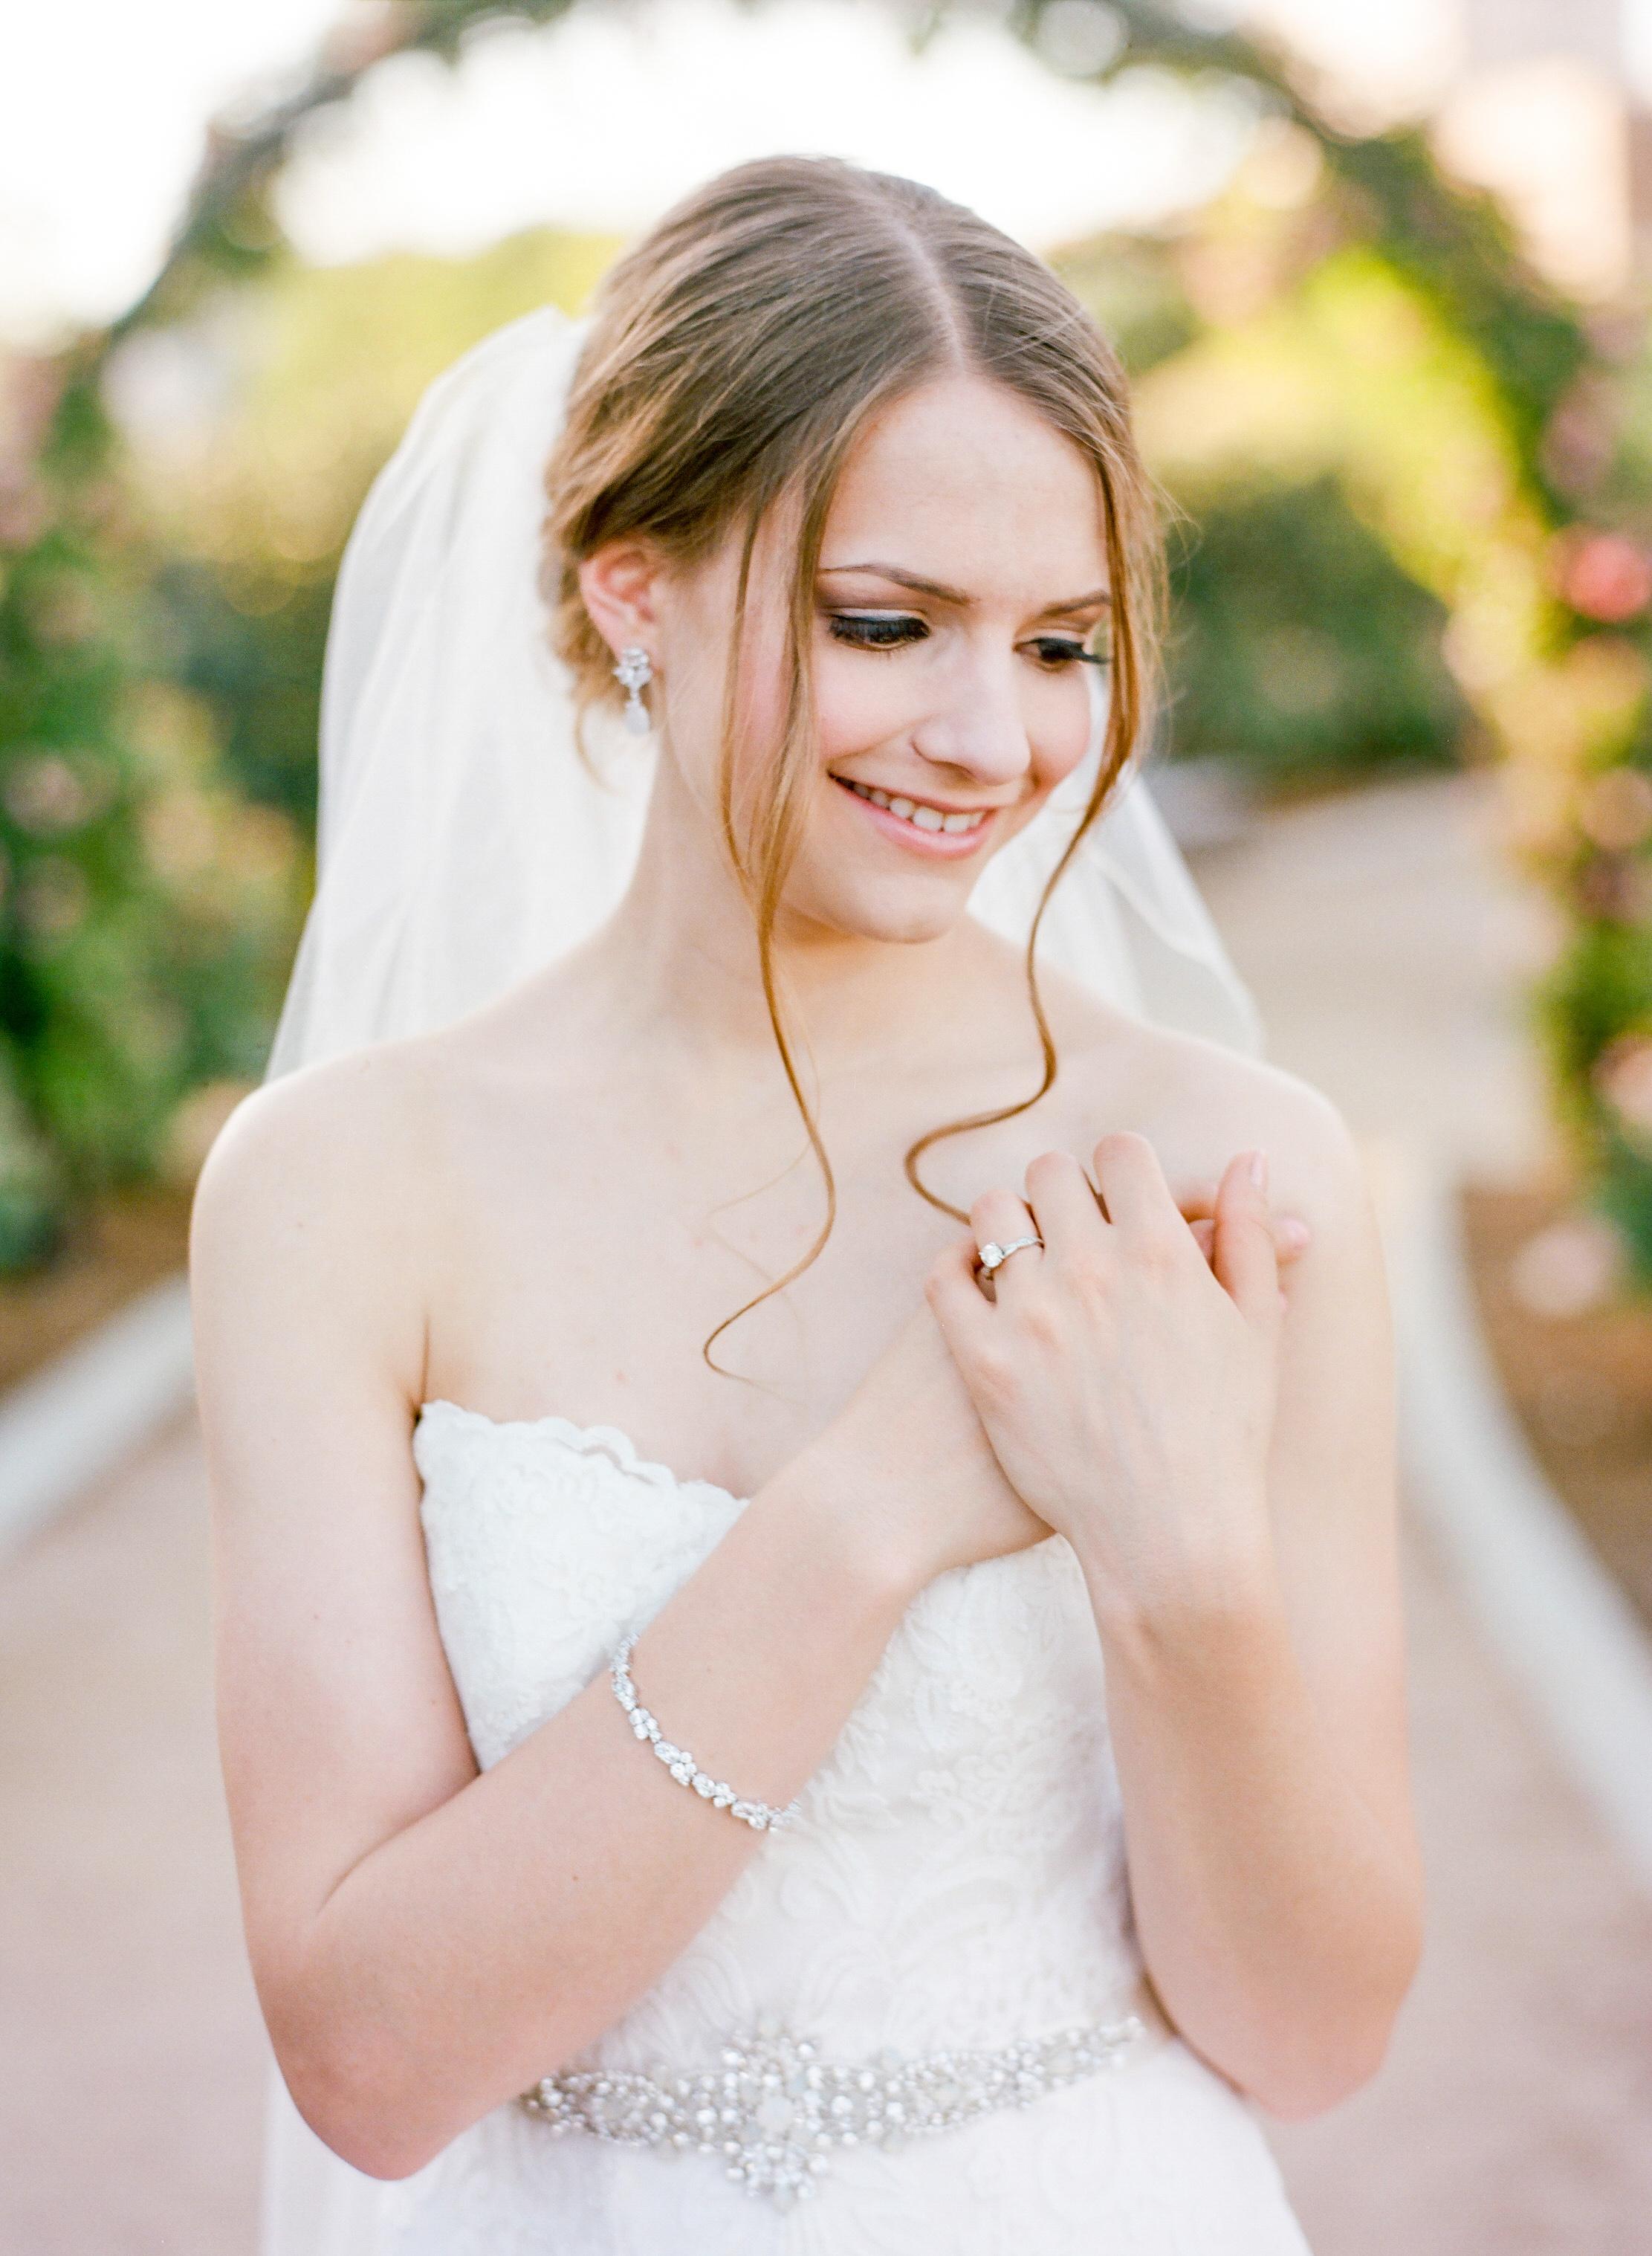 Houston-Wedding-Photographer-Film-Fine-Art-Bridals-Dana Fernandez-Photography-5.jpg